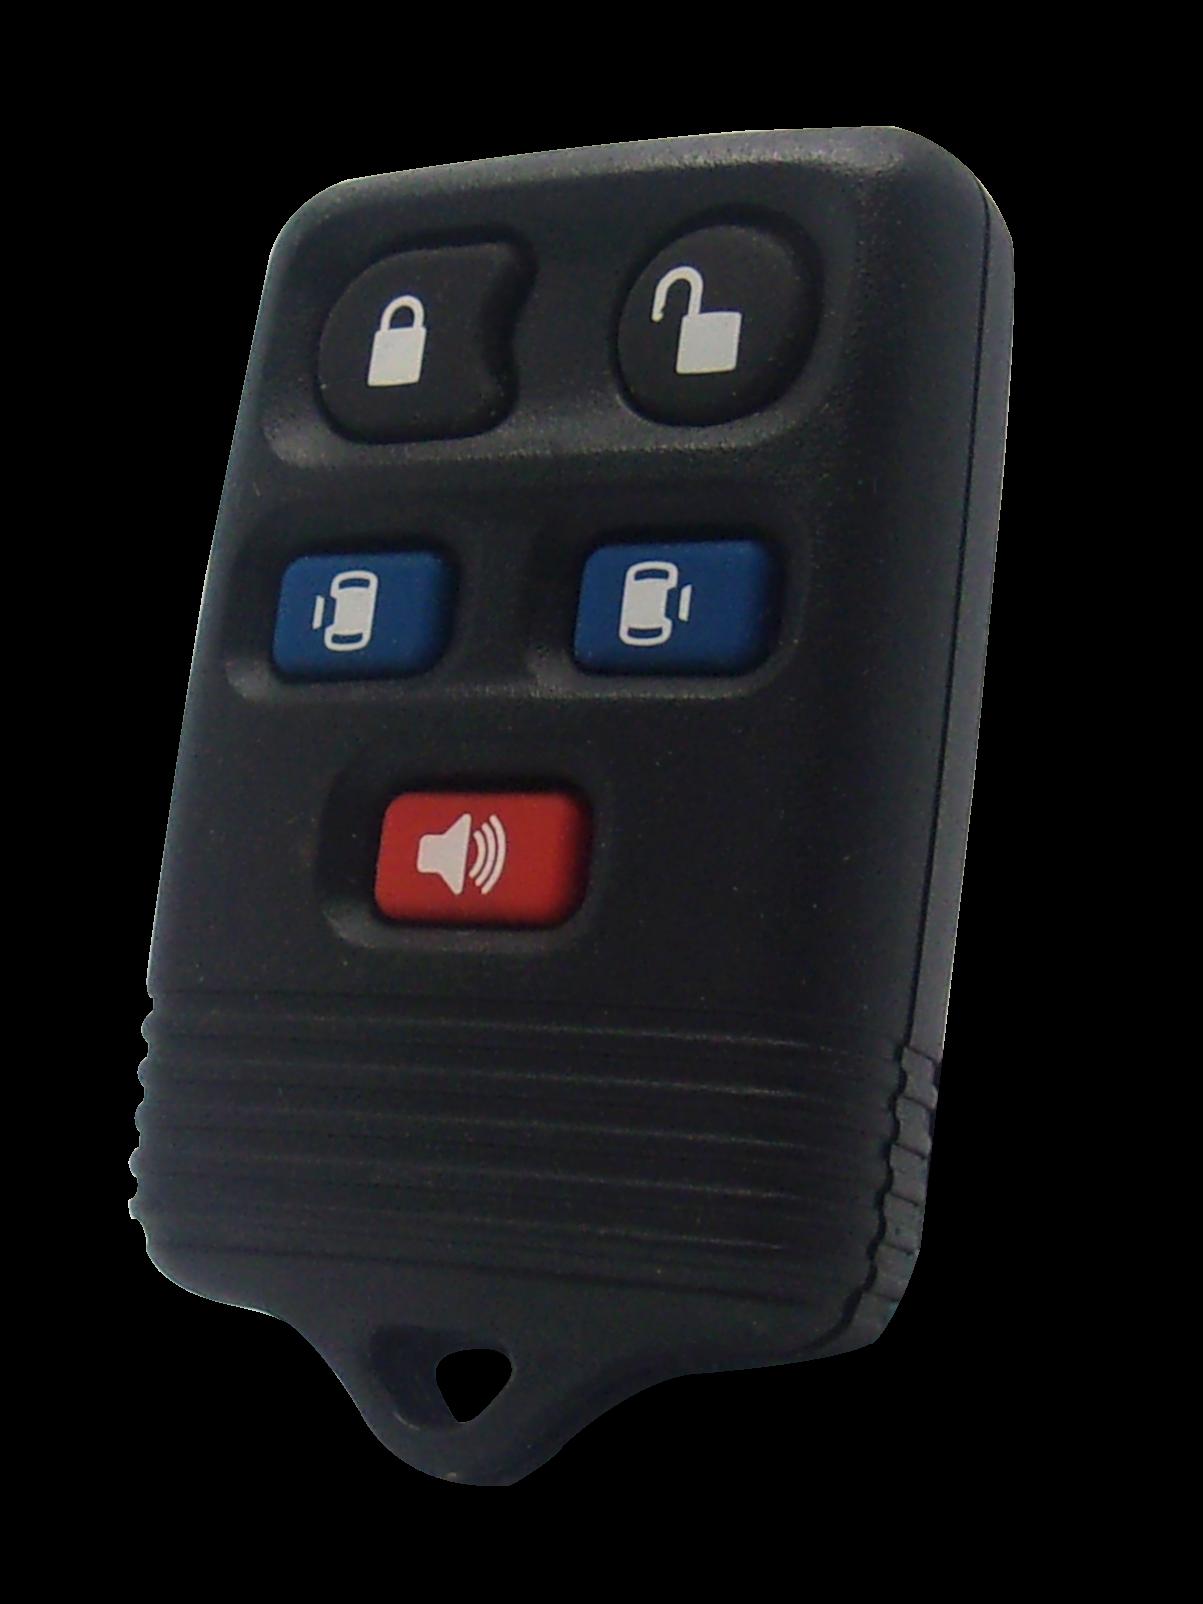 Ford / Mercury Keyless Entry Minivan Remote - 5 Button